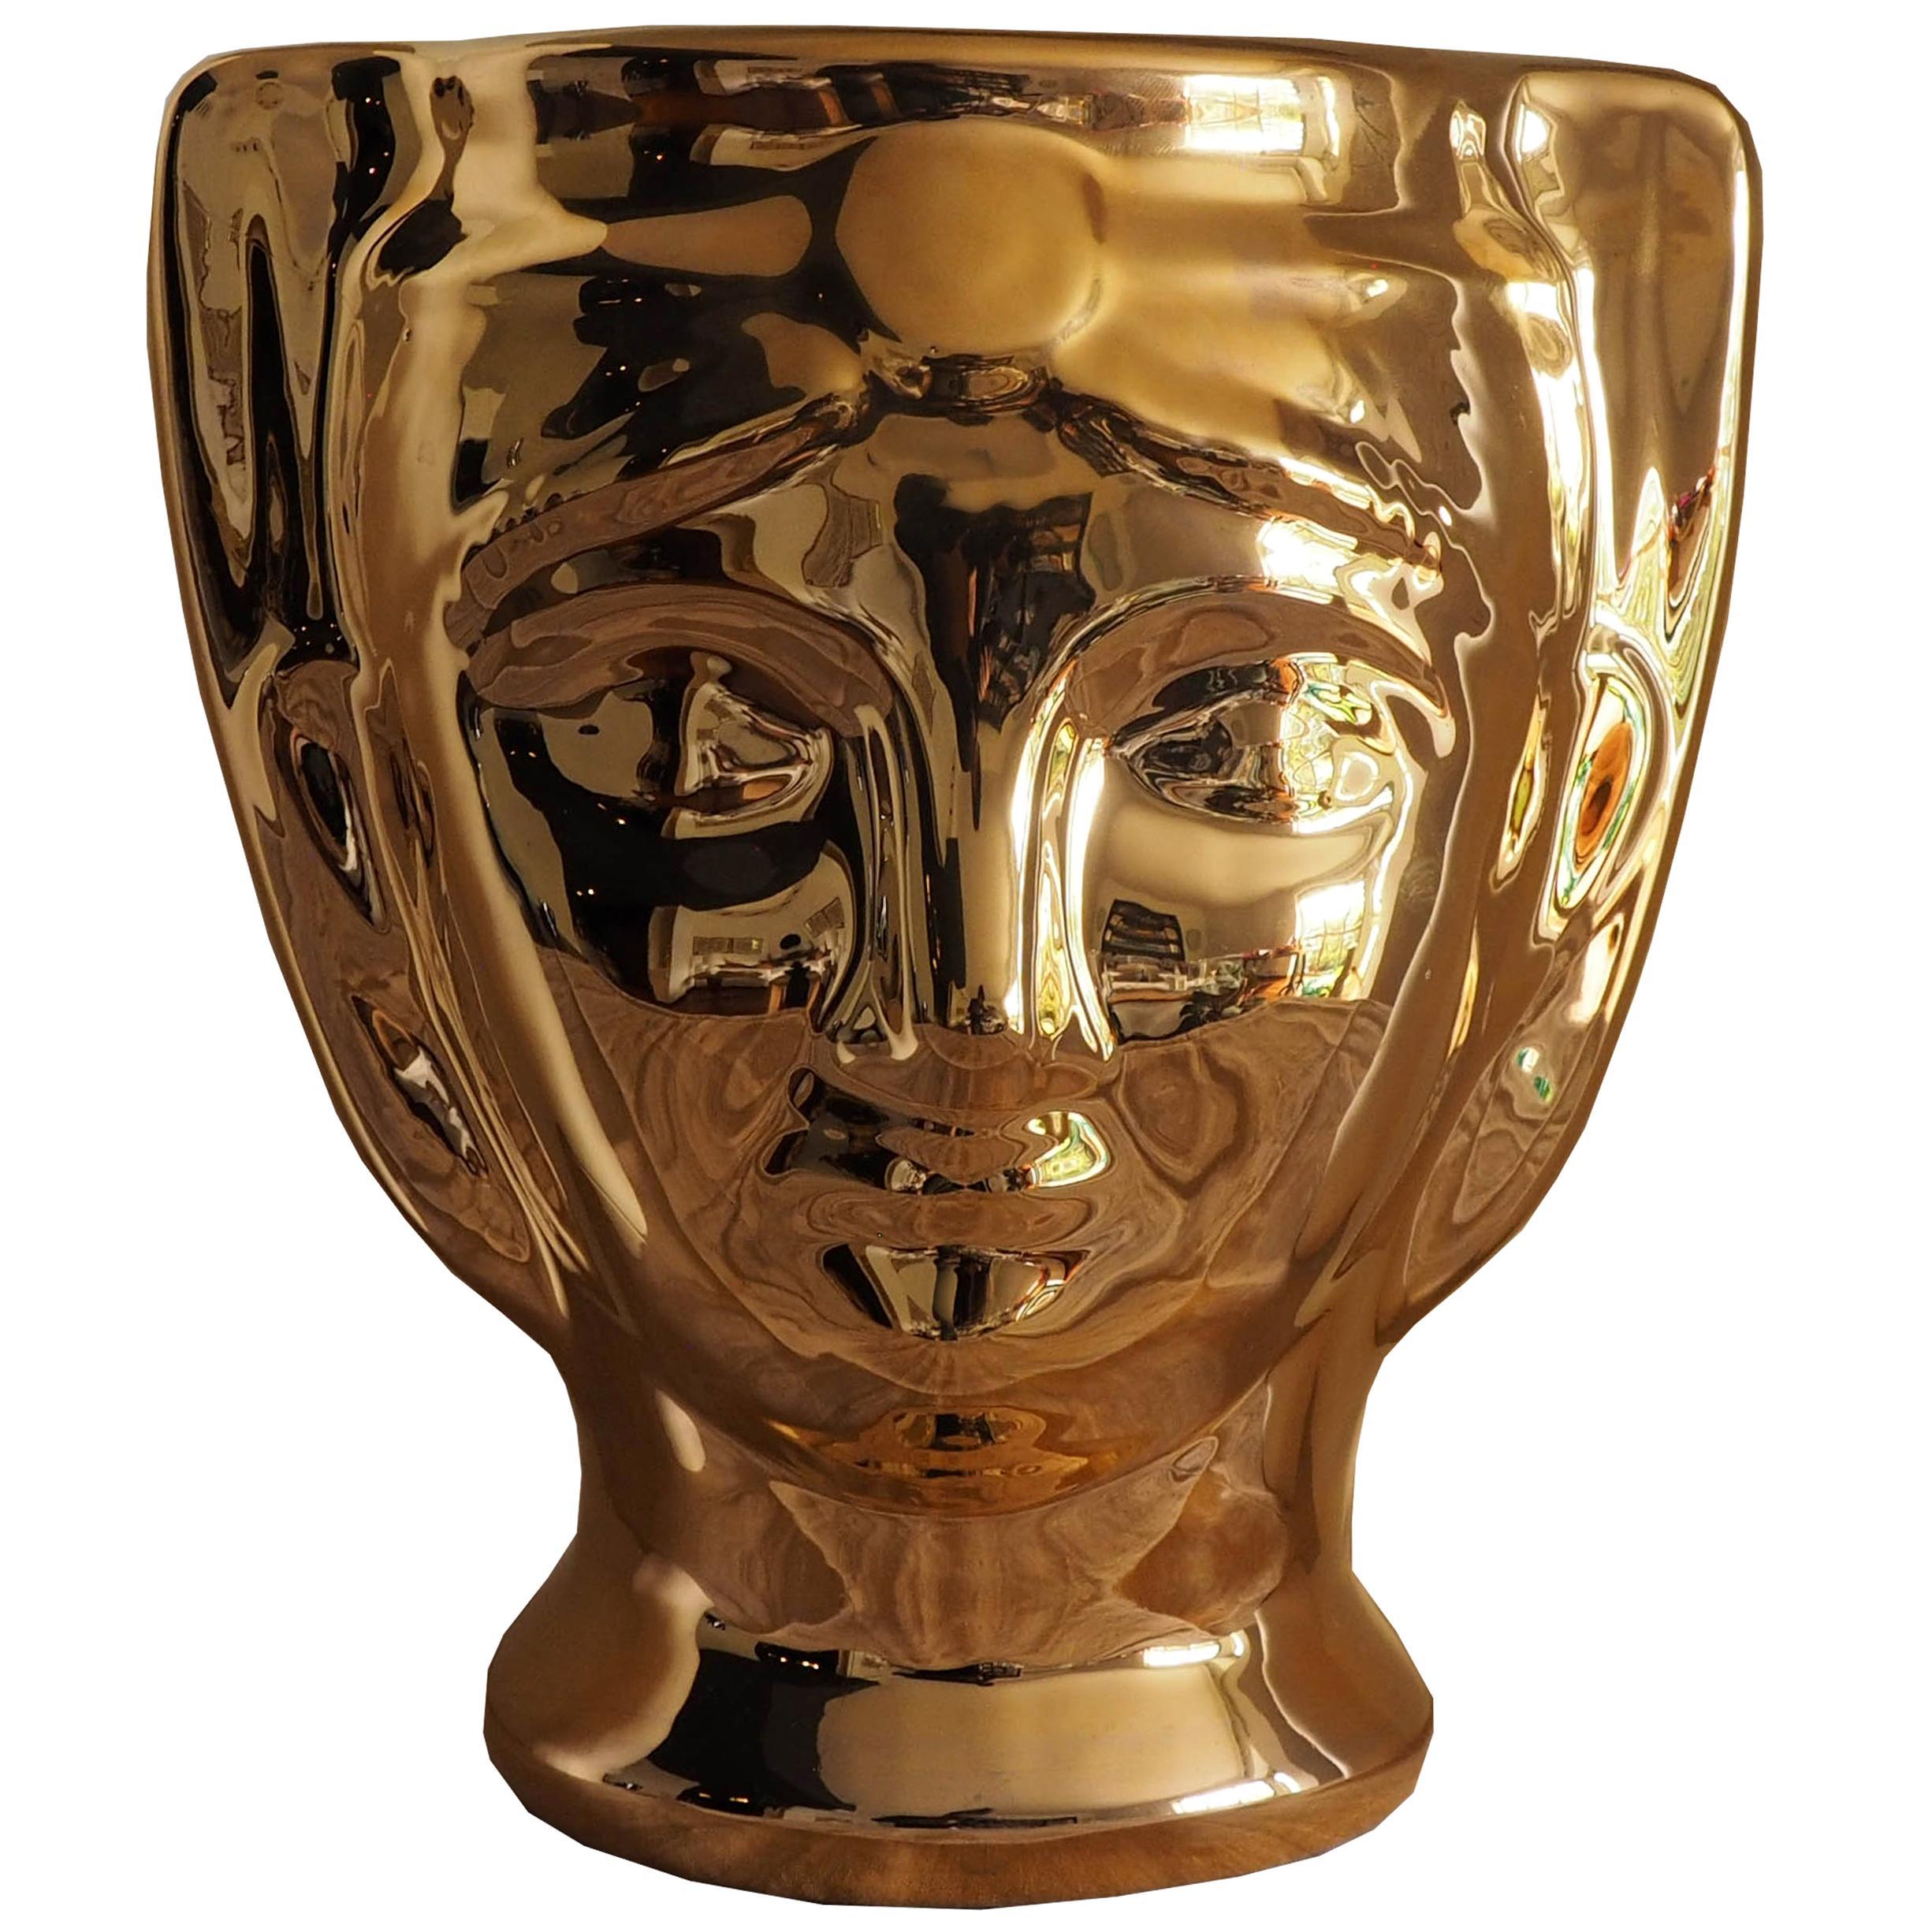 21st Century, SicilianMoor's Head. Ceramic Vases, Gold. Hand Made Made in Italy